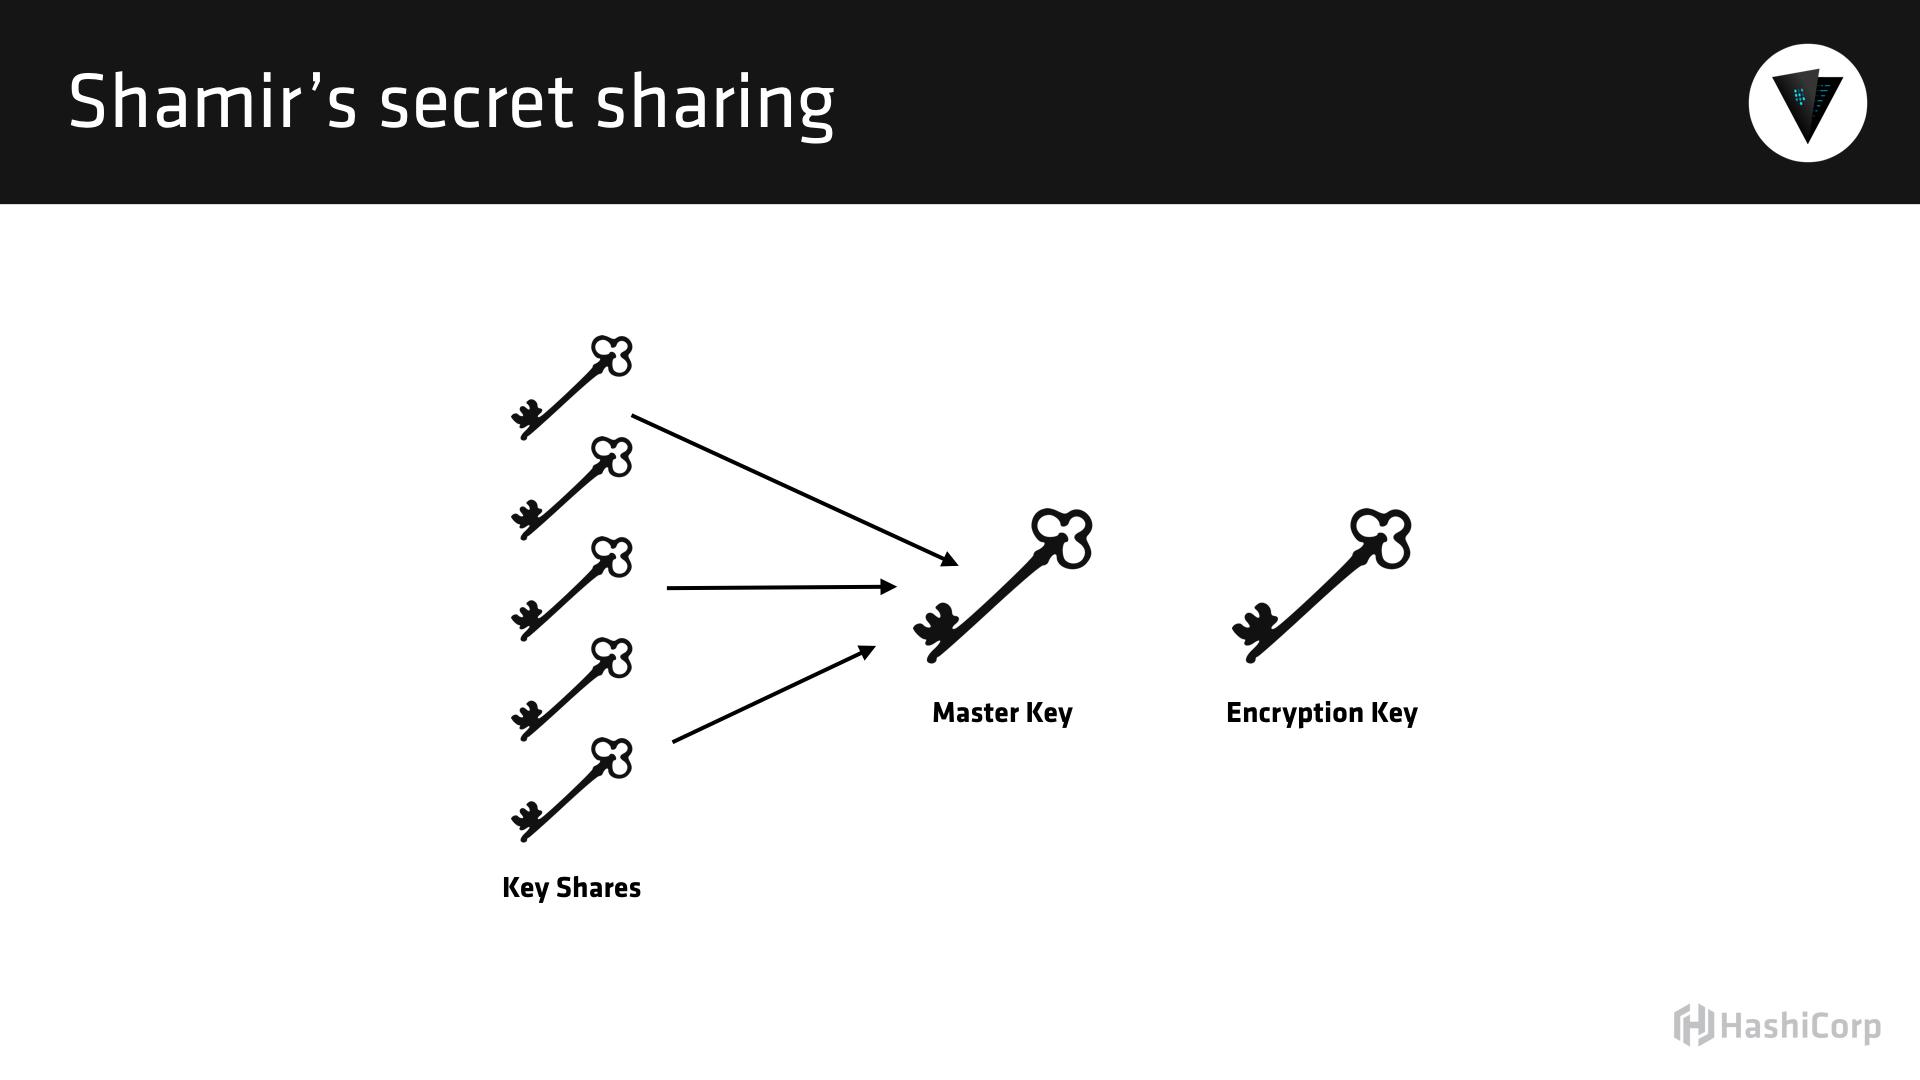 Secret Management And Vault With Hashicorp S Seth Vargo